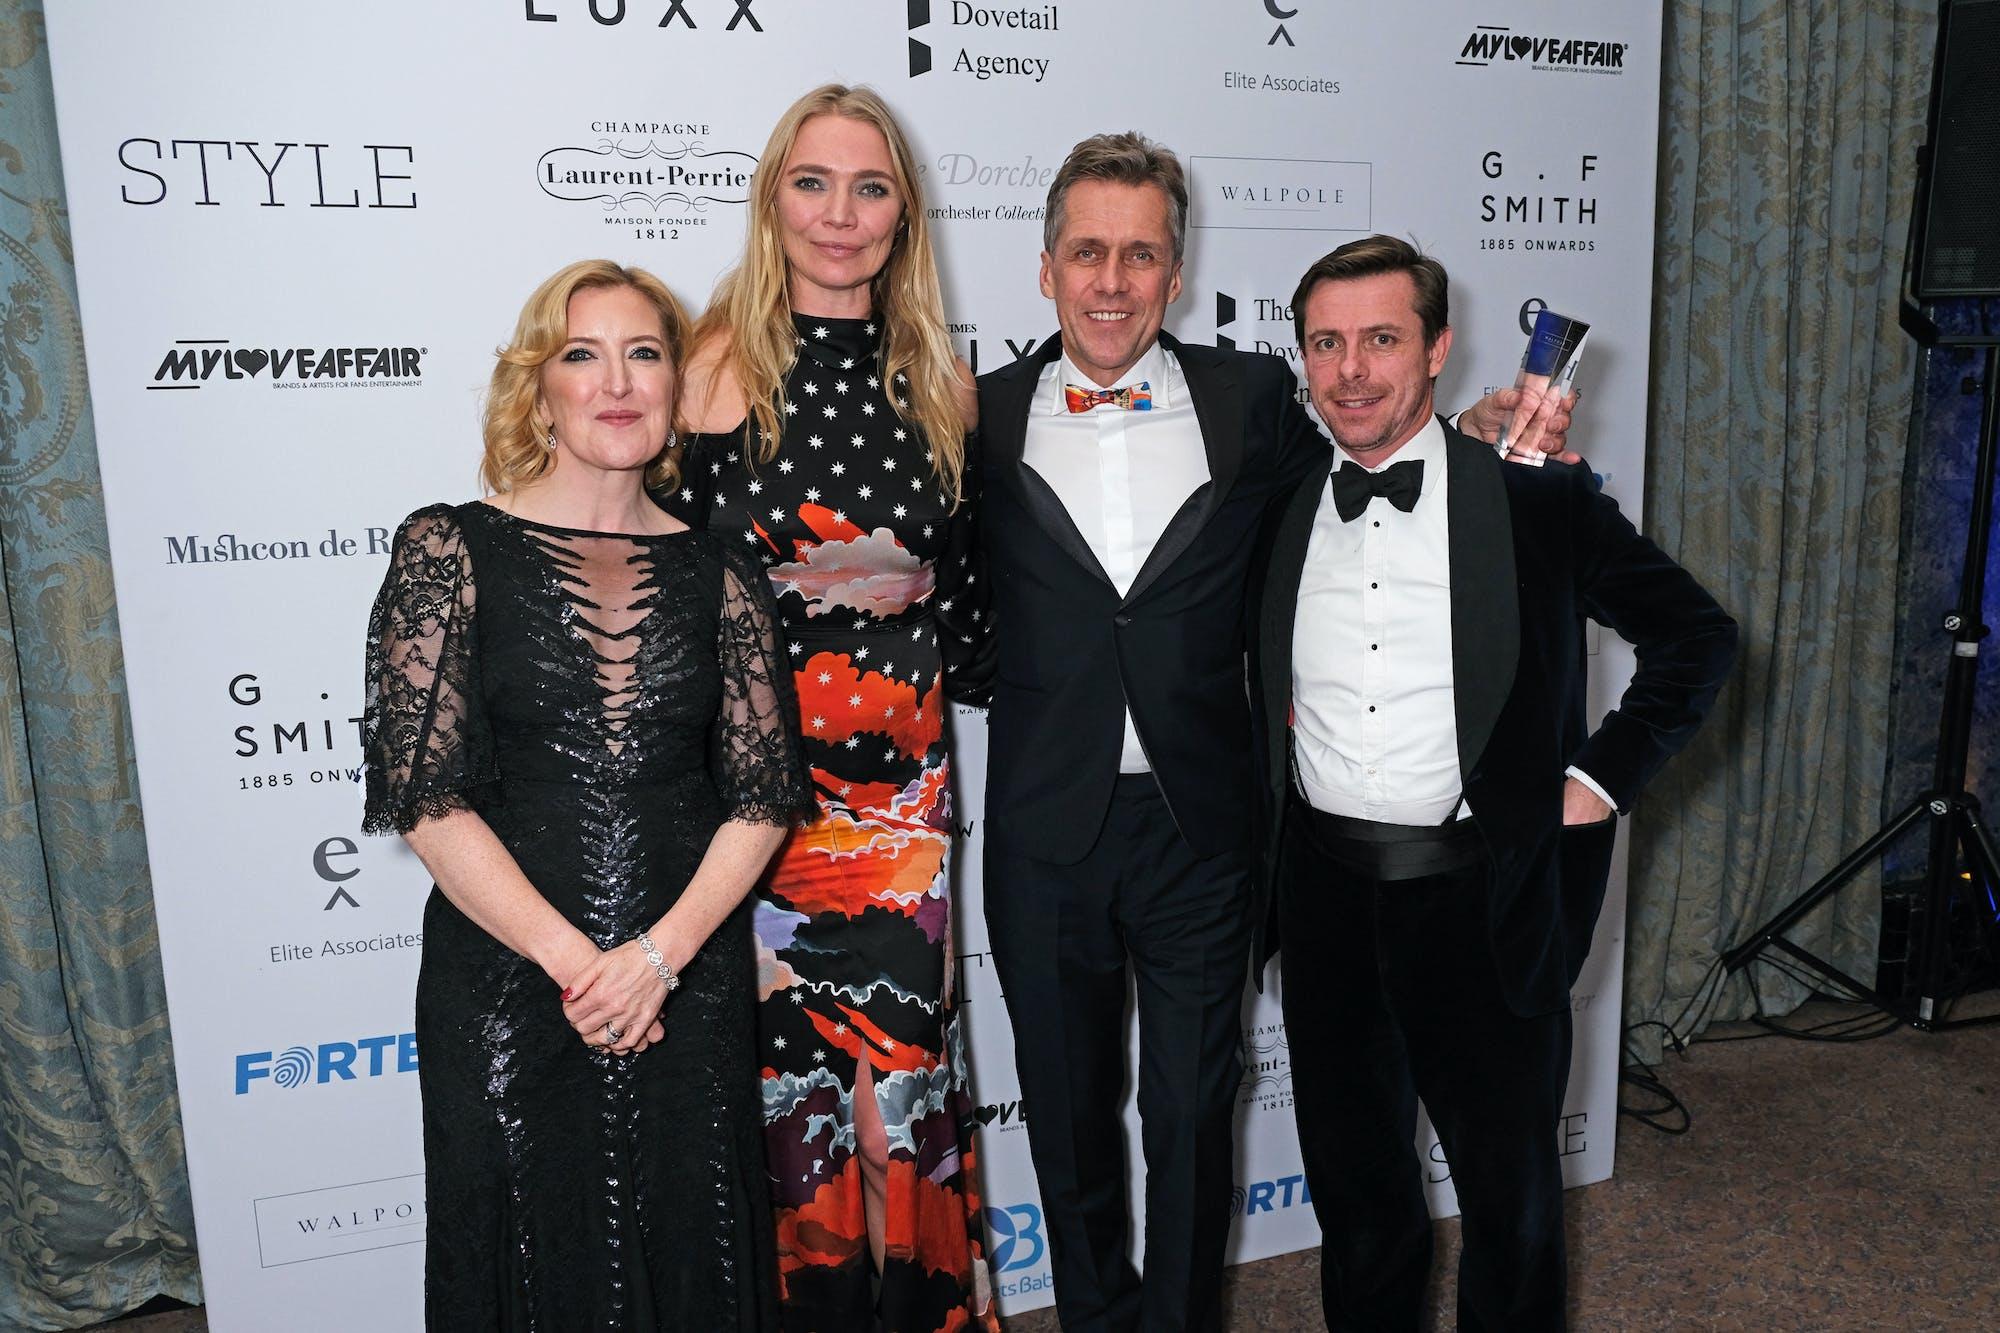 Walpole Awards 2019  What's your biggest luxury?